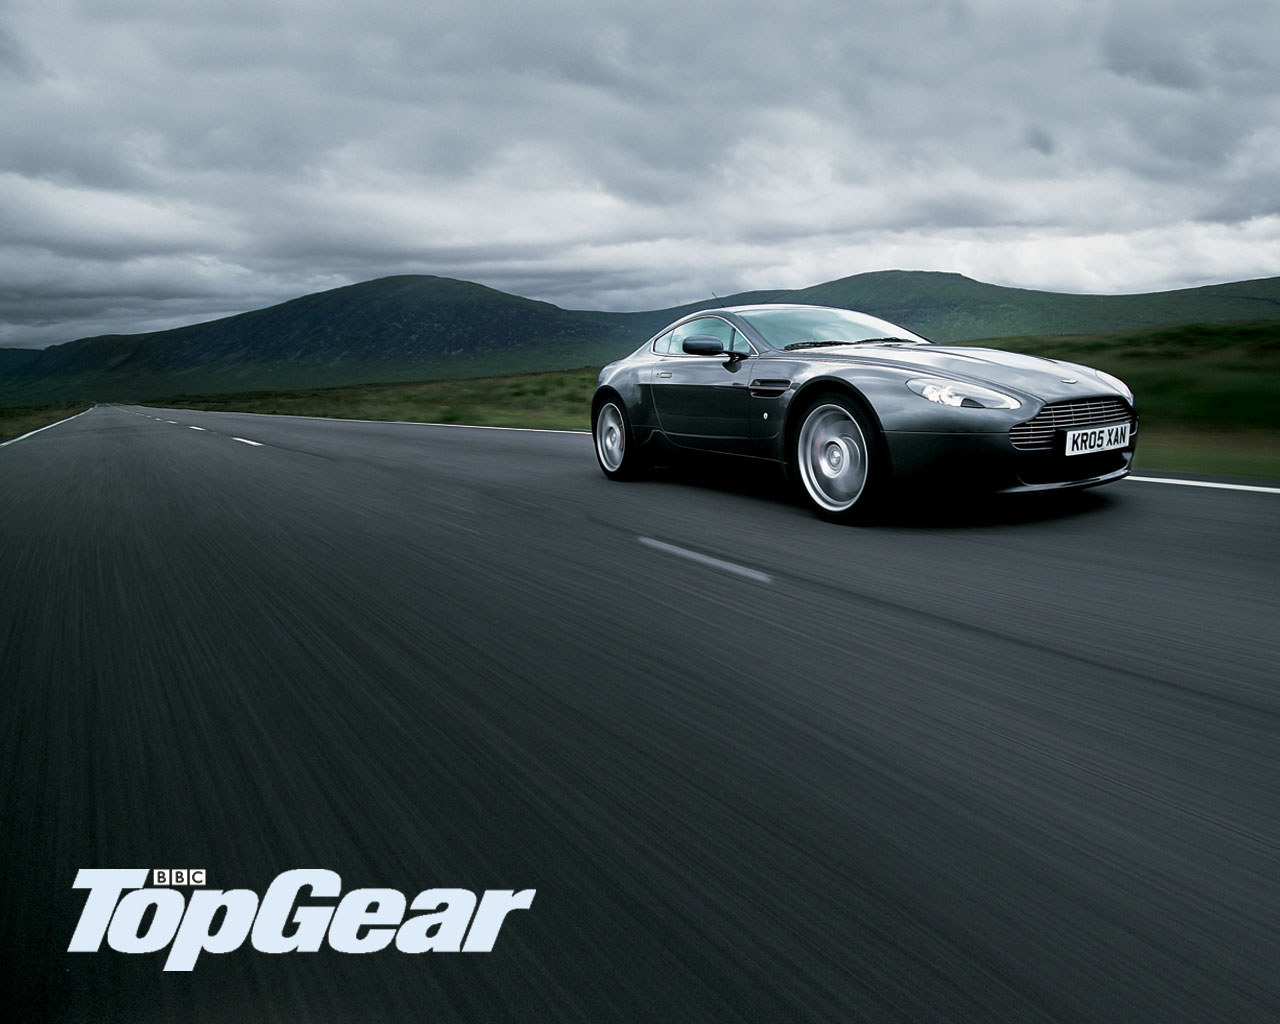 Wallaper Top Gear Aston Martin